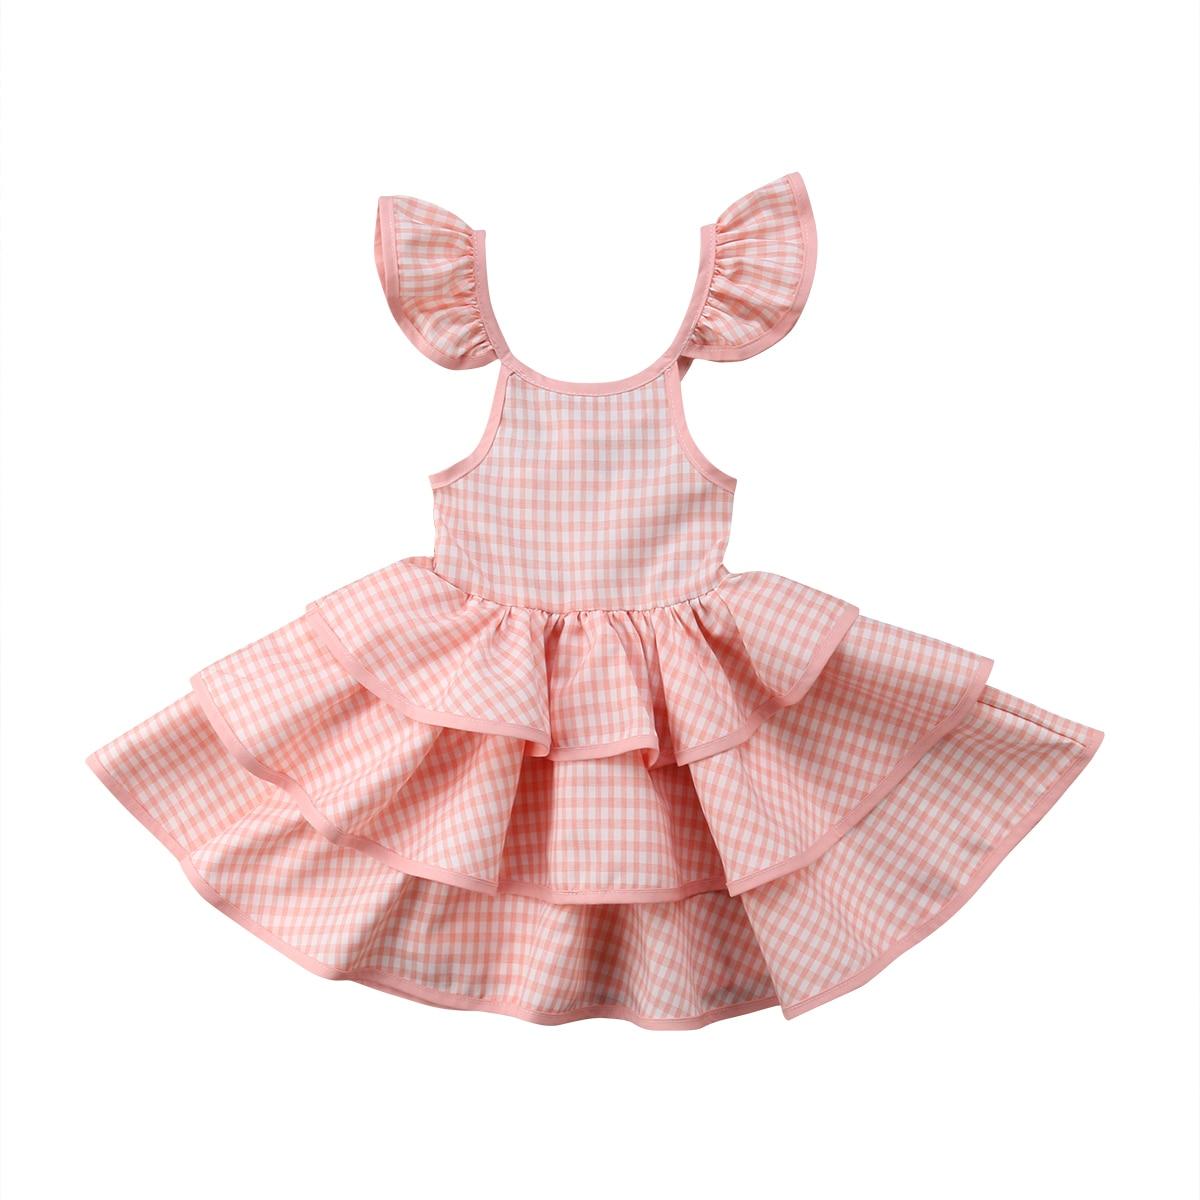 New Toddler Kids Baby Girls Plaid Dress Princess Tulle Summer Sleeveless Dresses